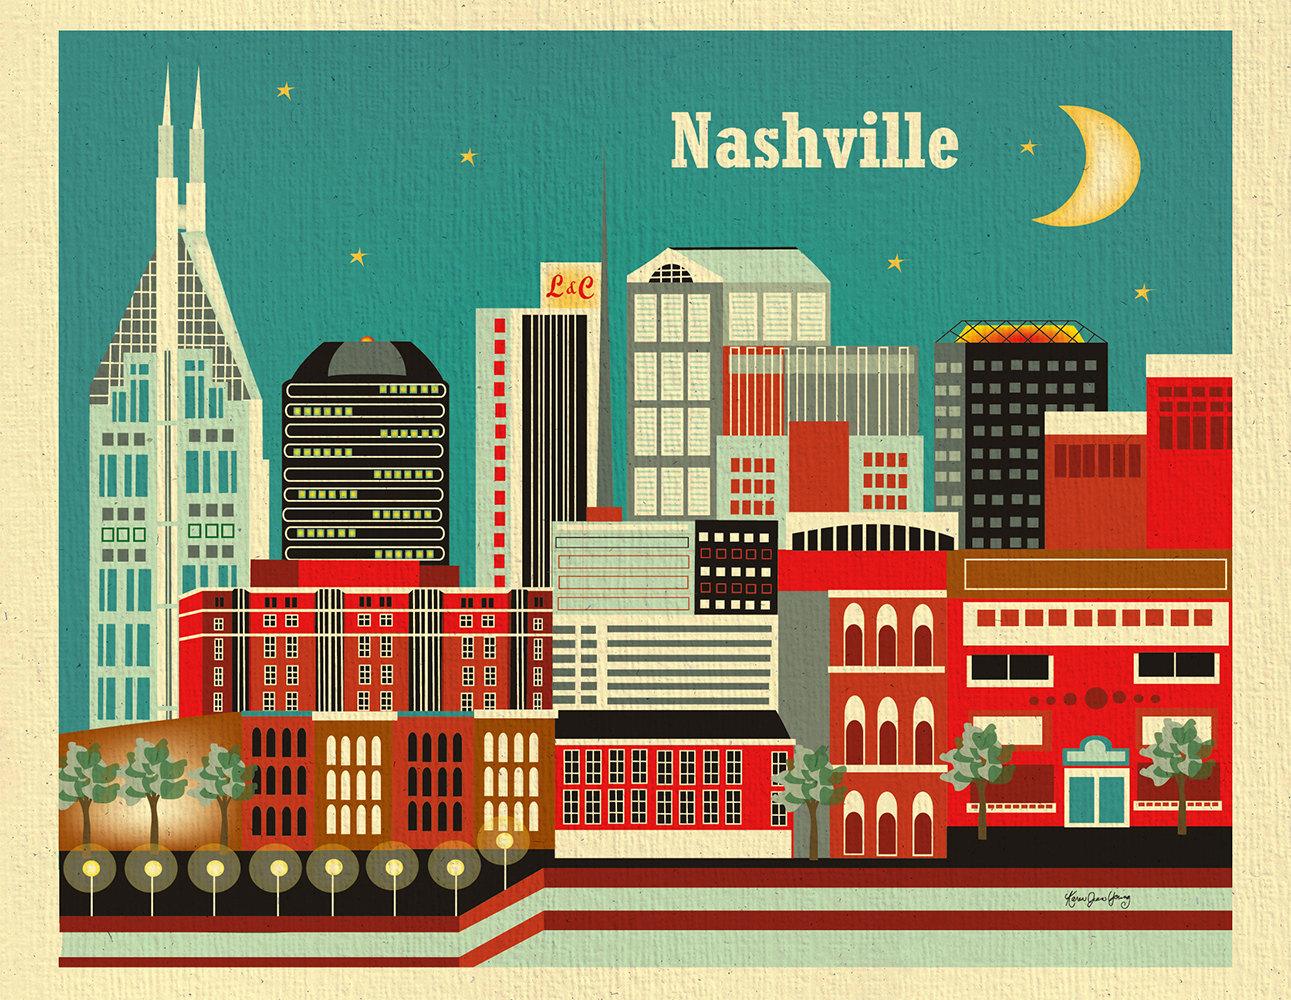 Nashville Poster, Print, Greeting Card illustration